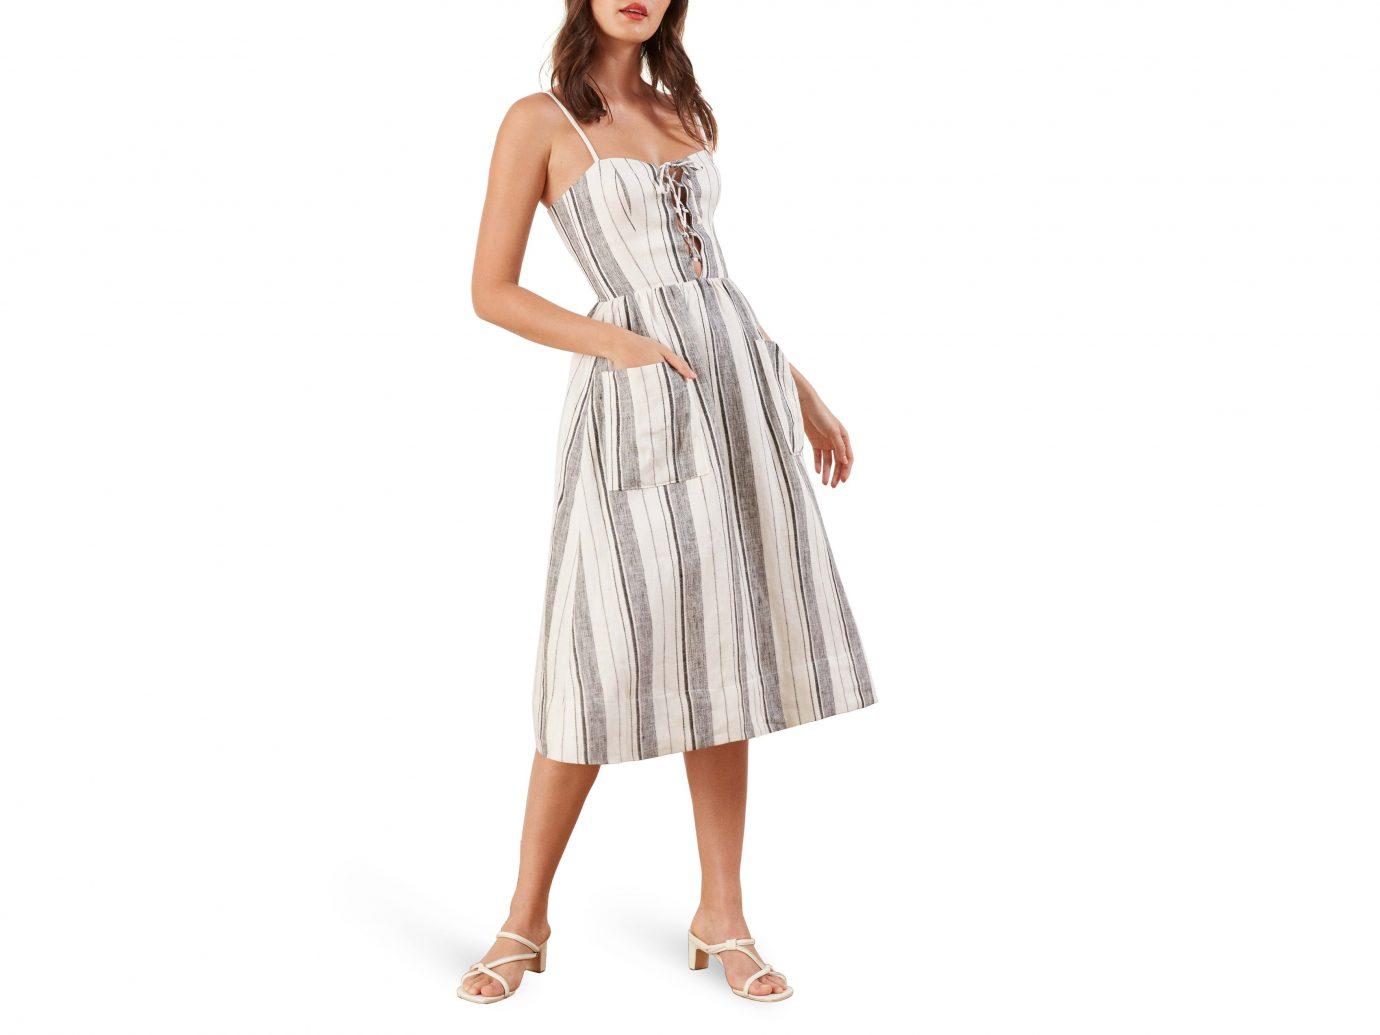 Reformation Striped Dress